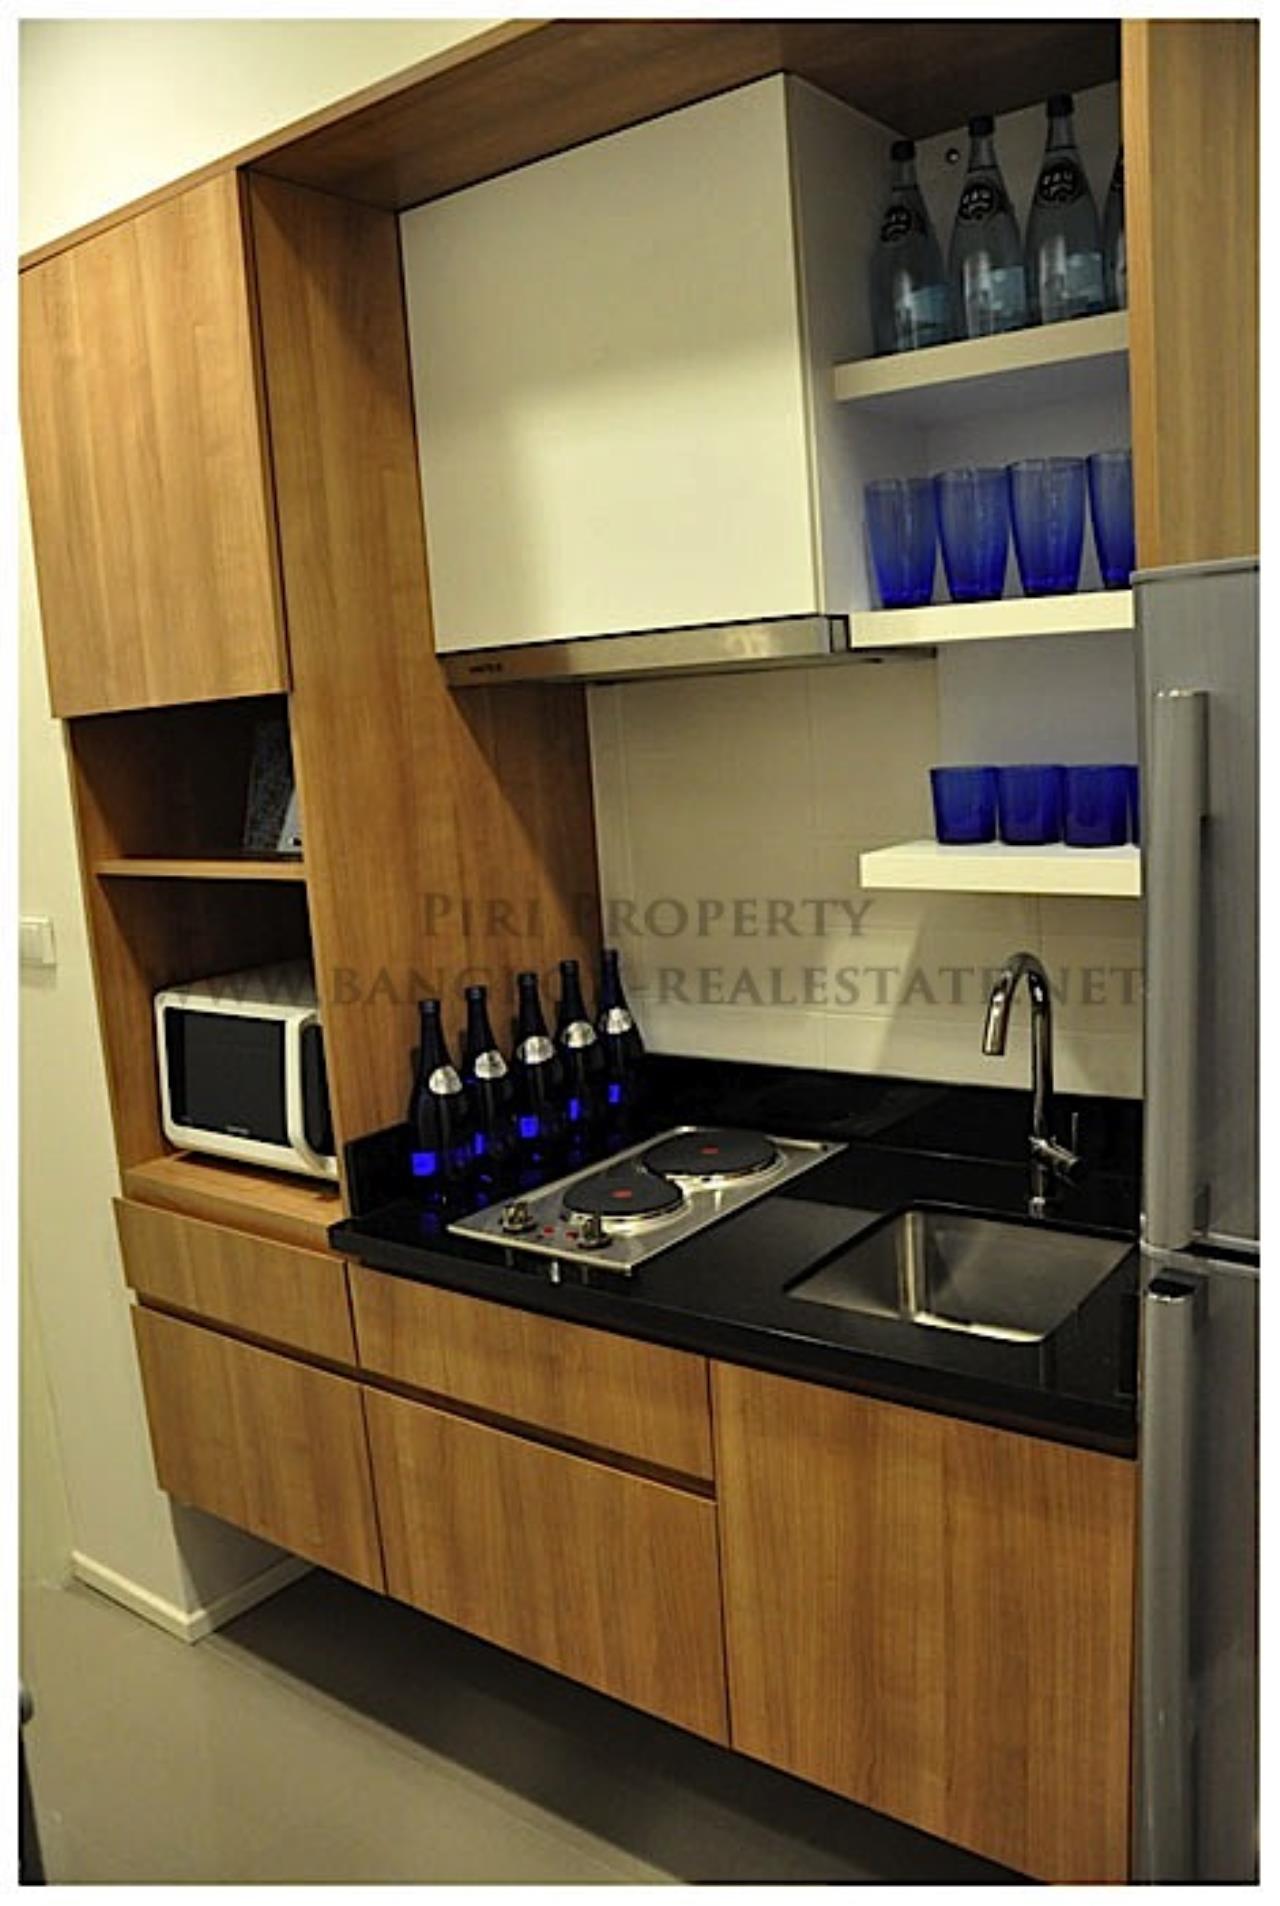 Piri Property Agency's Brand New Condominium - Blocs 77 for Rent 4